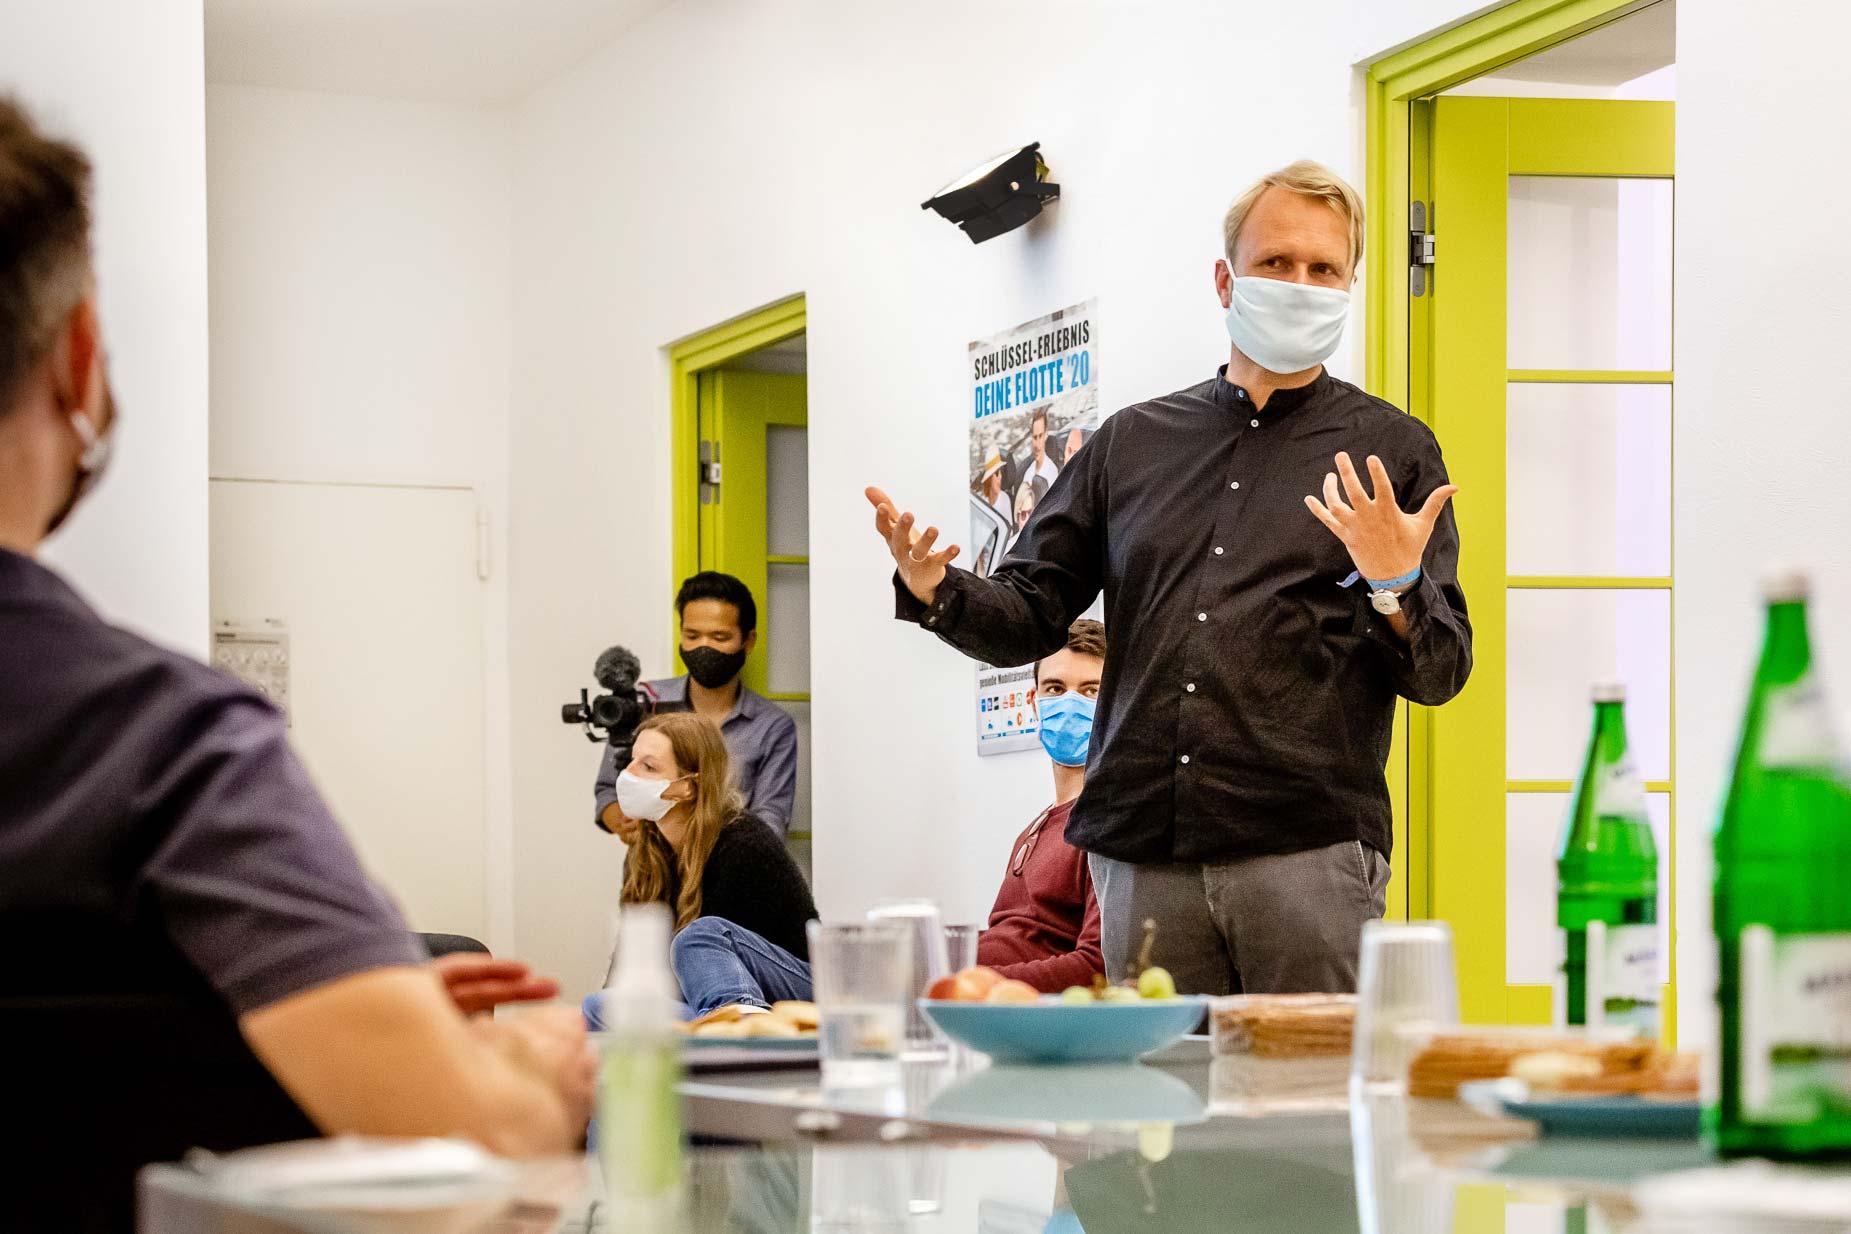 eventfotografie-veranstaltung-berlin-neue-mobilitaet